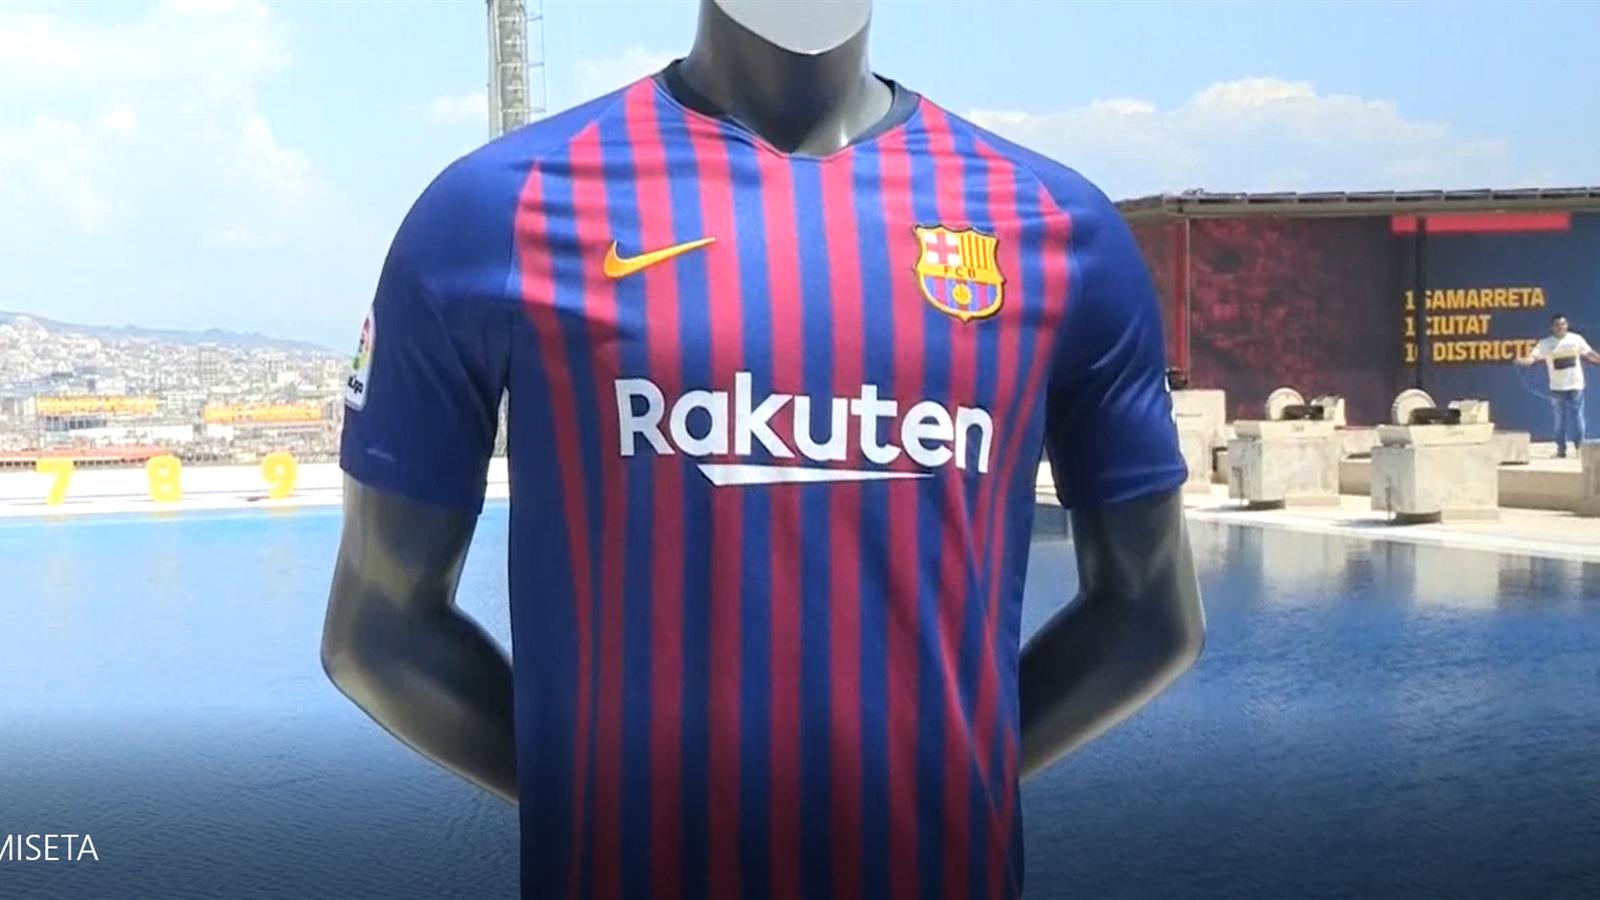 VIDEO - Esta será la camiseta del Barcelona para la temporada 2018 19 -  Video Eurosport Espana 295f3fb4878